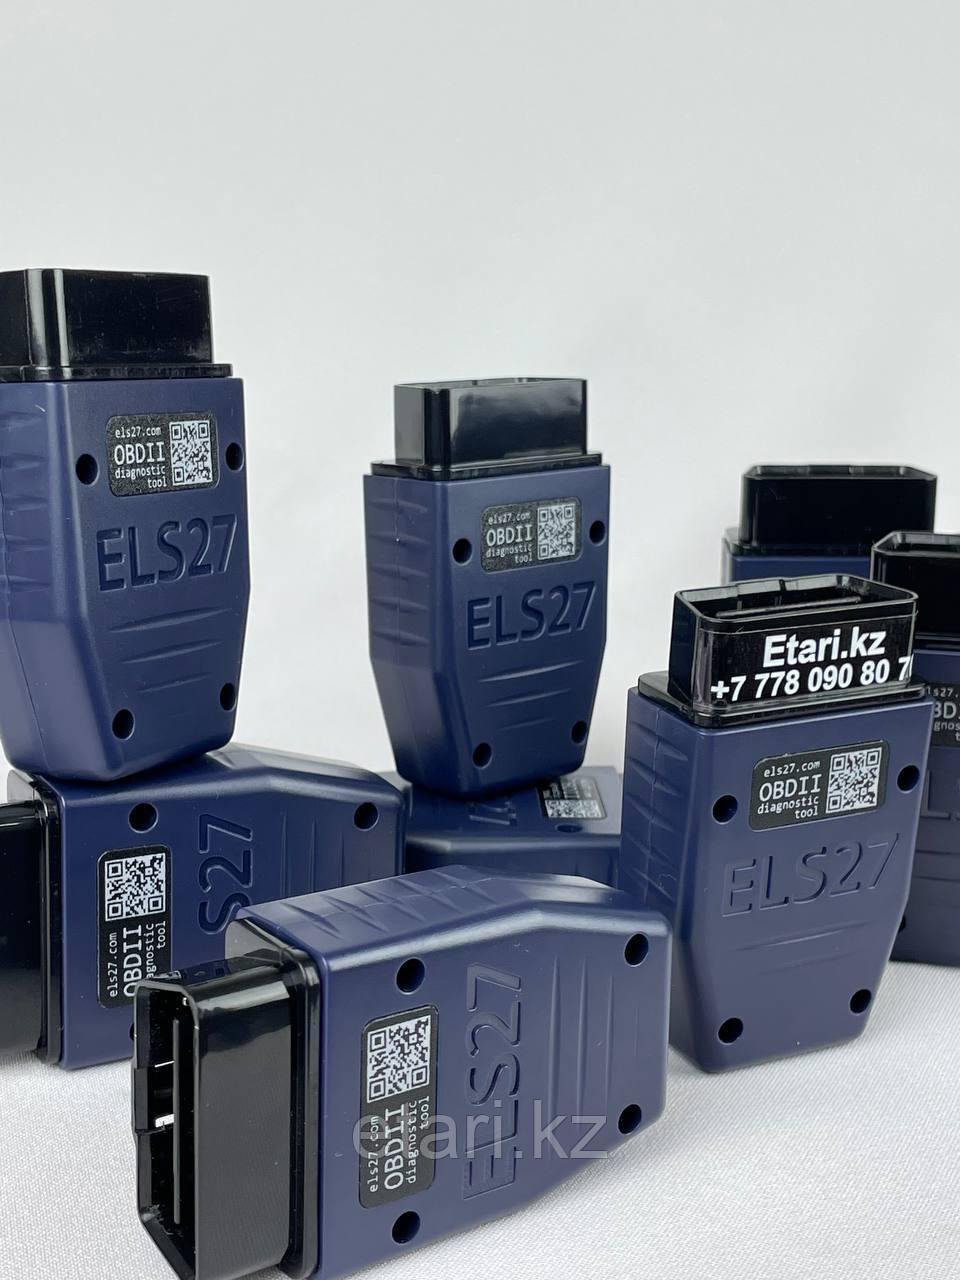 Автосканер ELS 27 v4.0